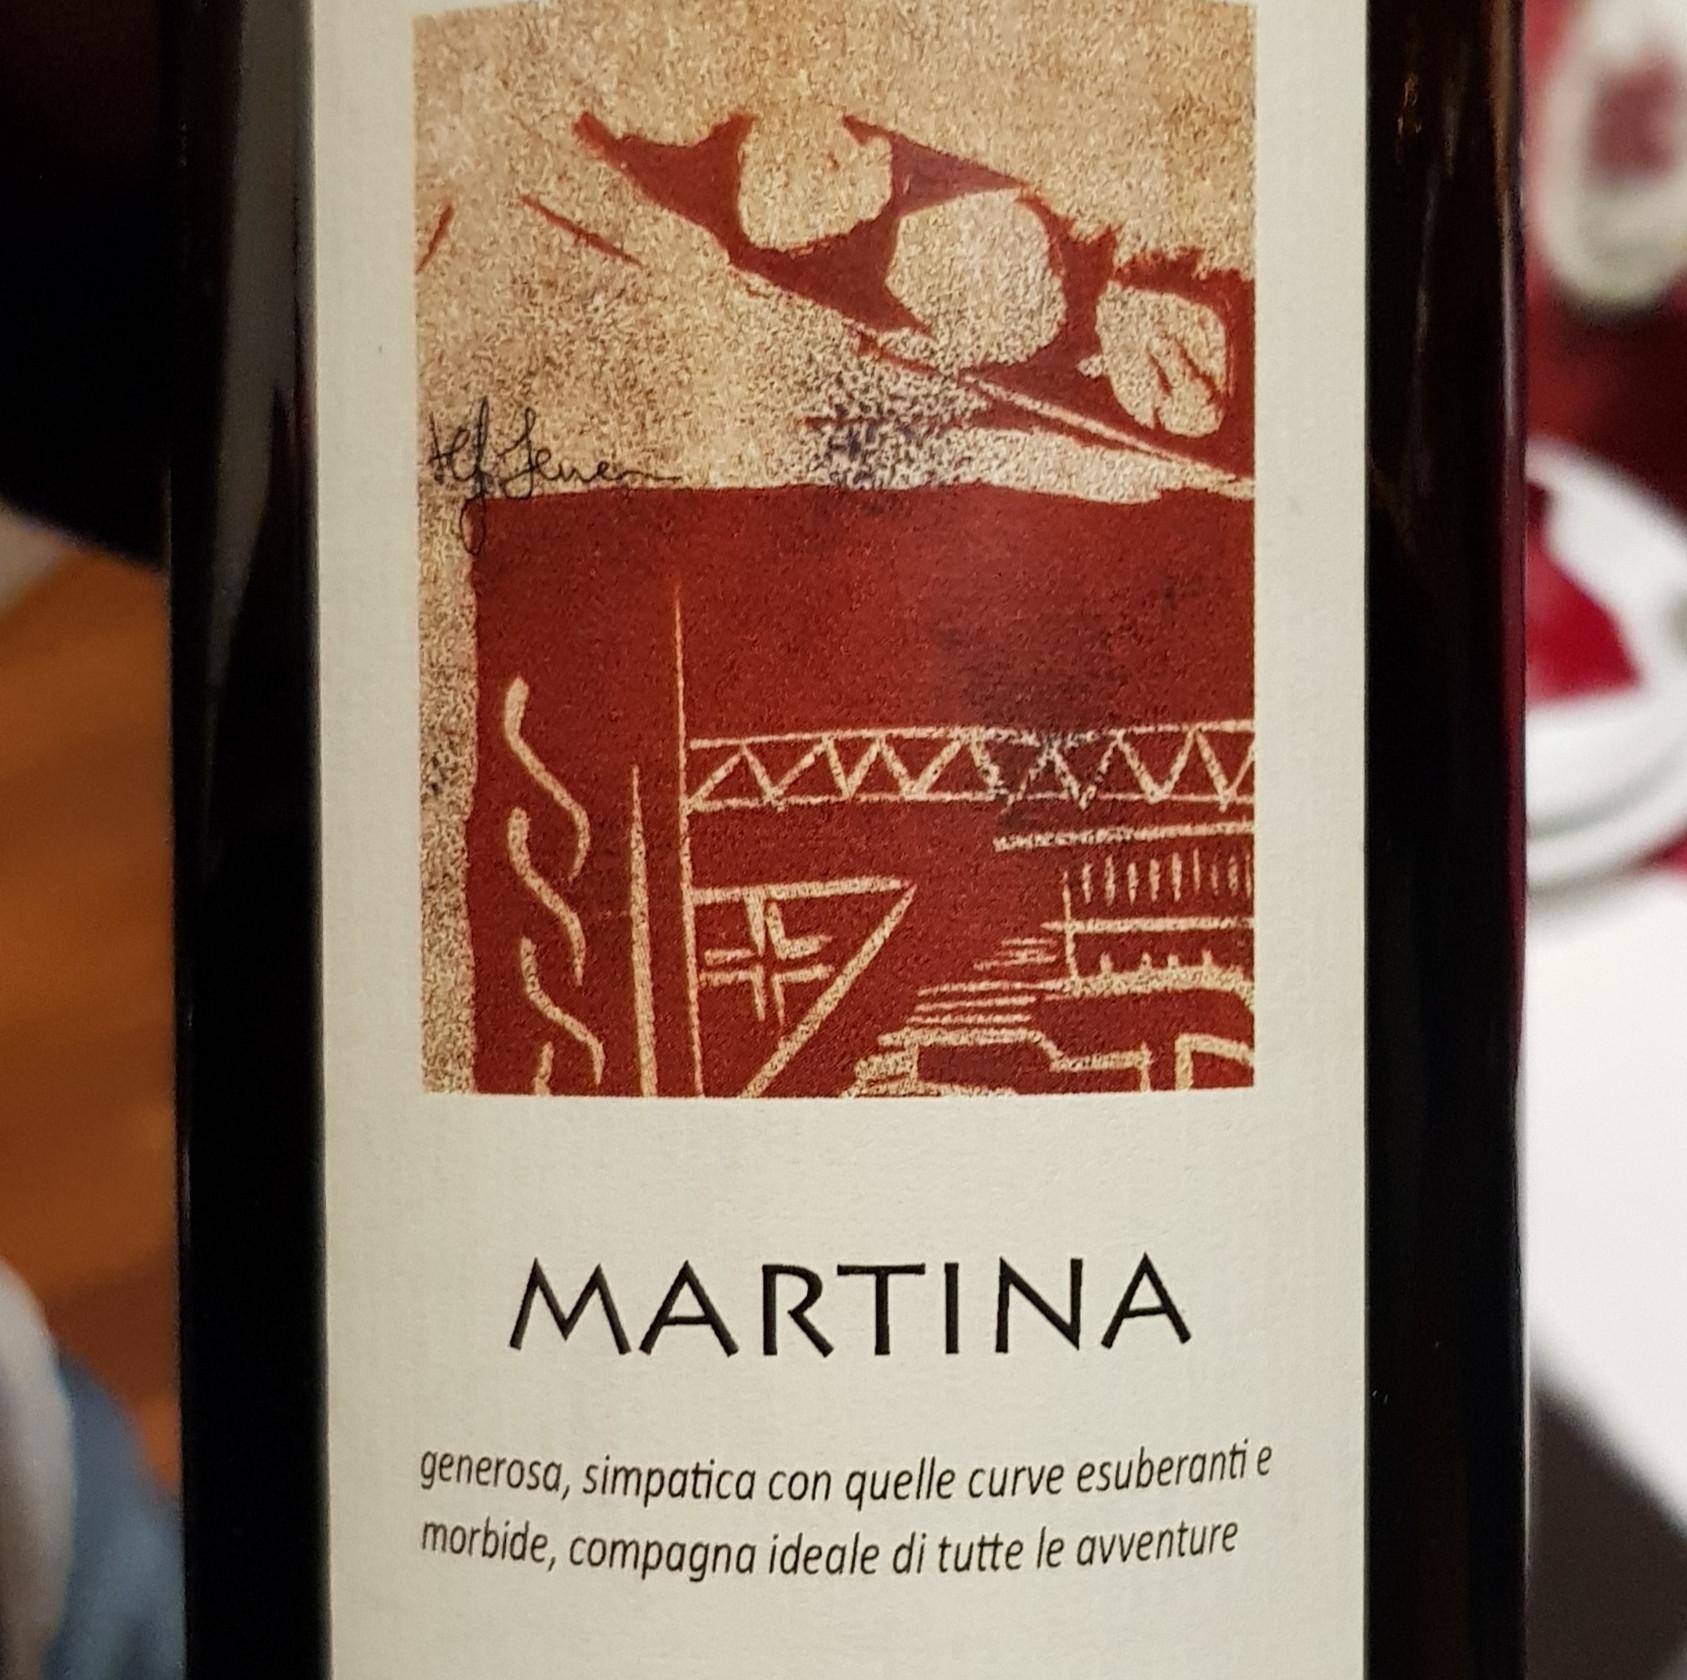 Martina La Barbera